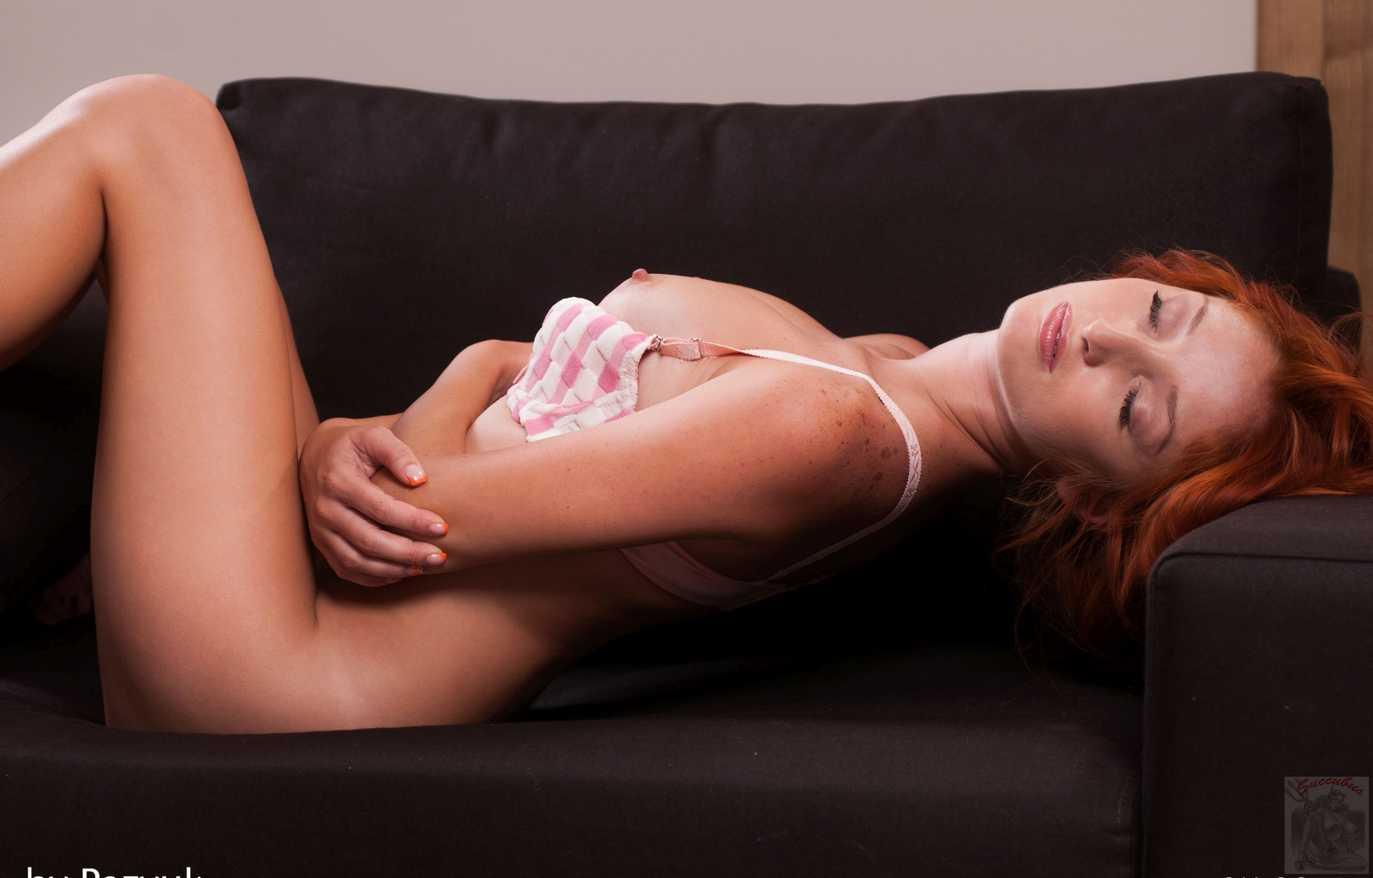 jeune fille rousse nue (118)